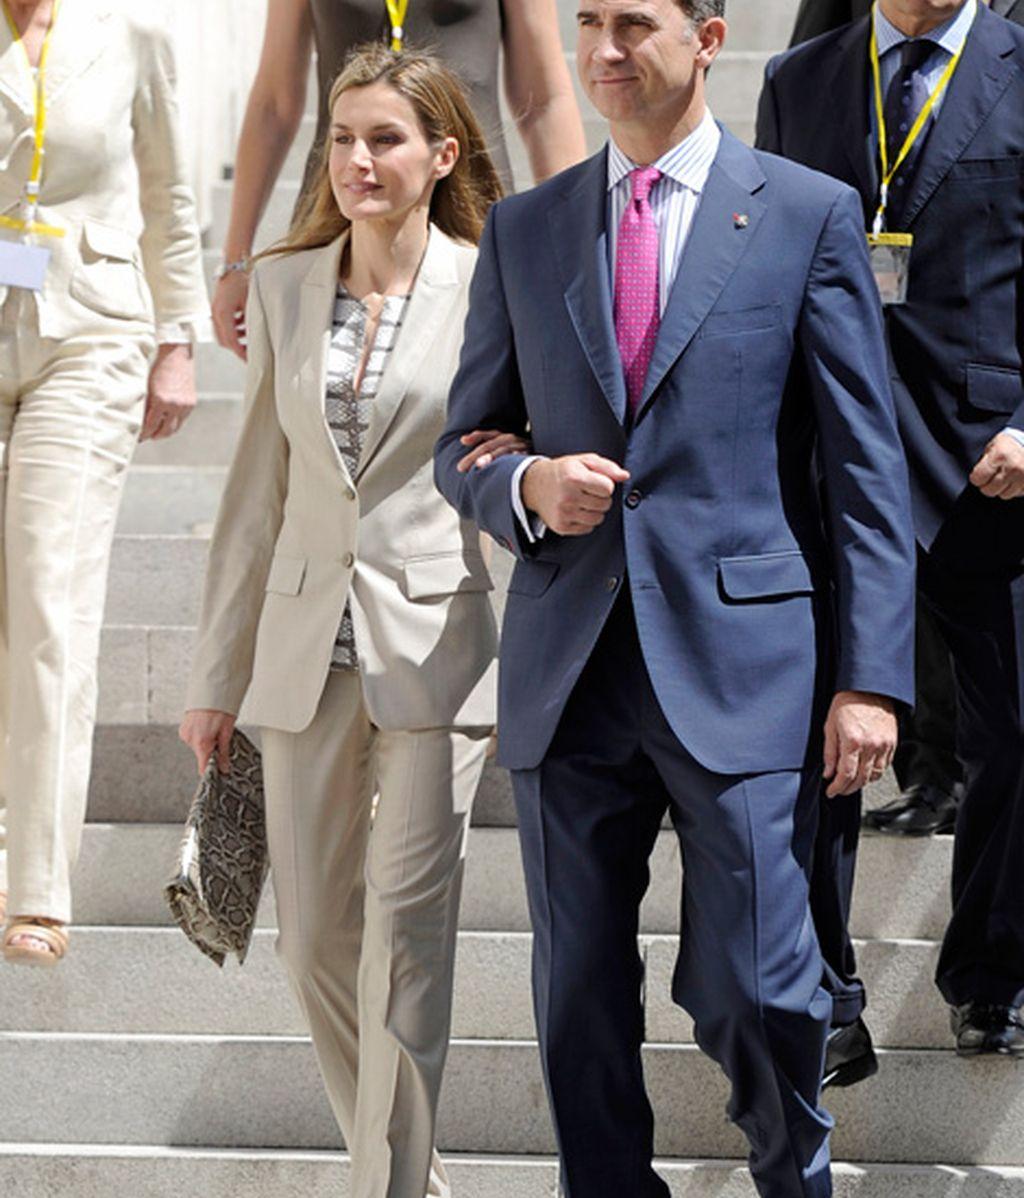 Últimos actos como príncipes de Asturias (junio 2014)